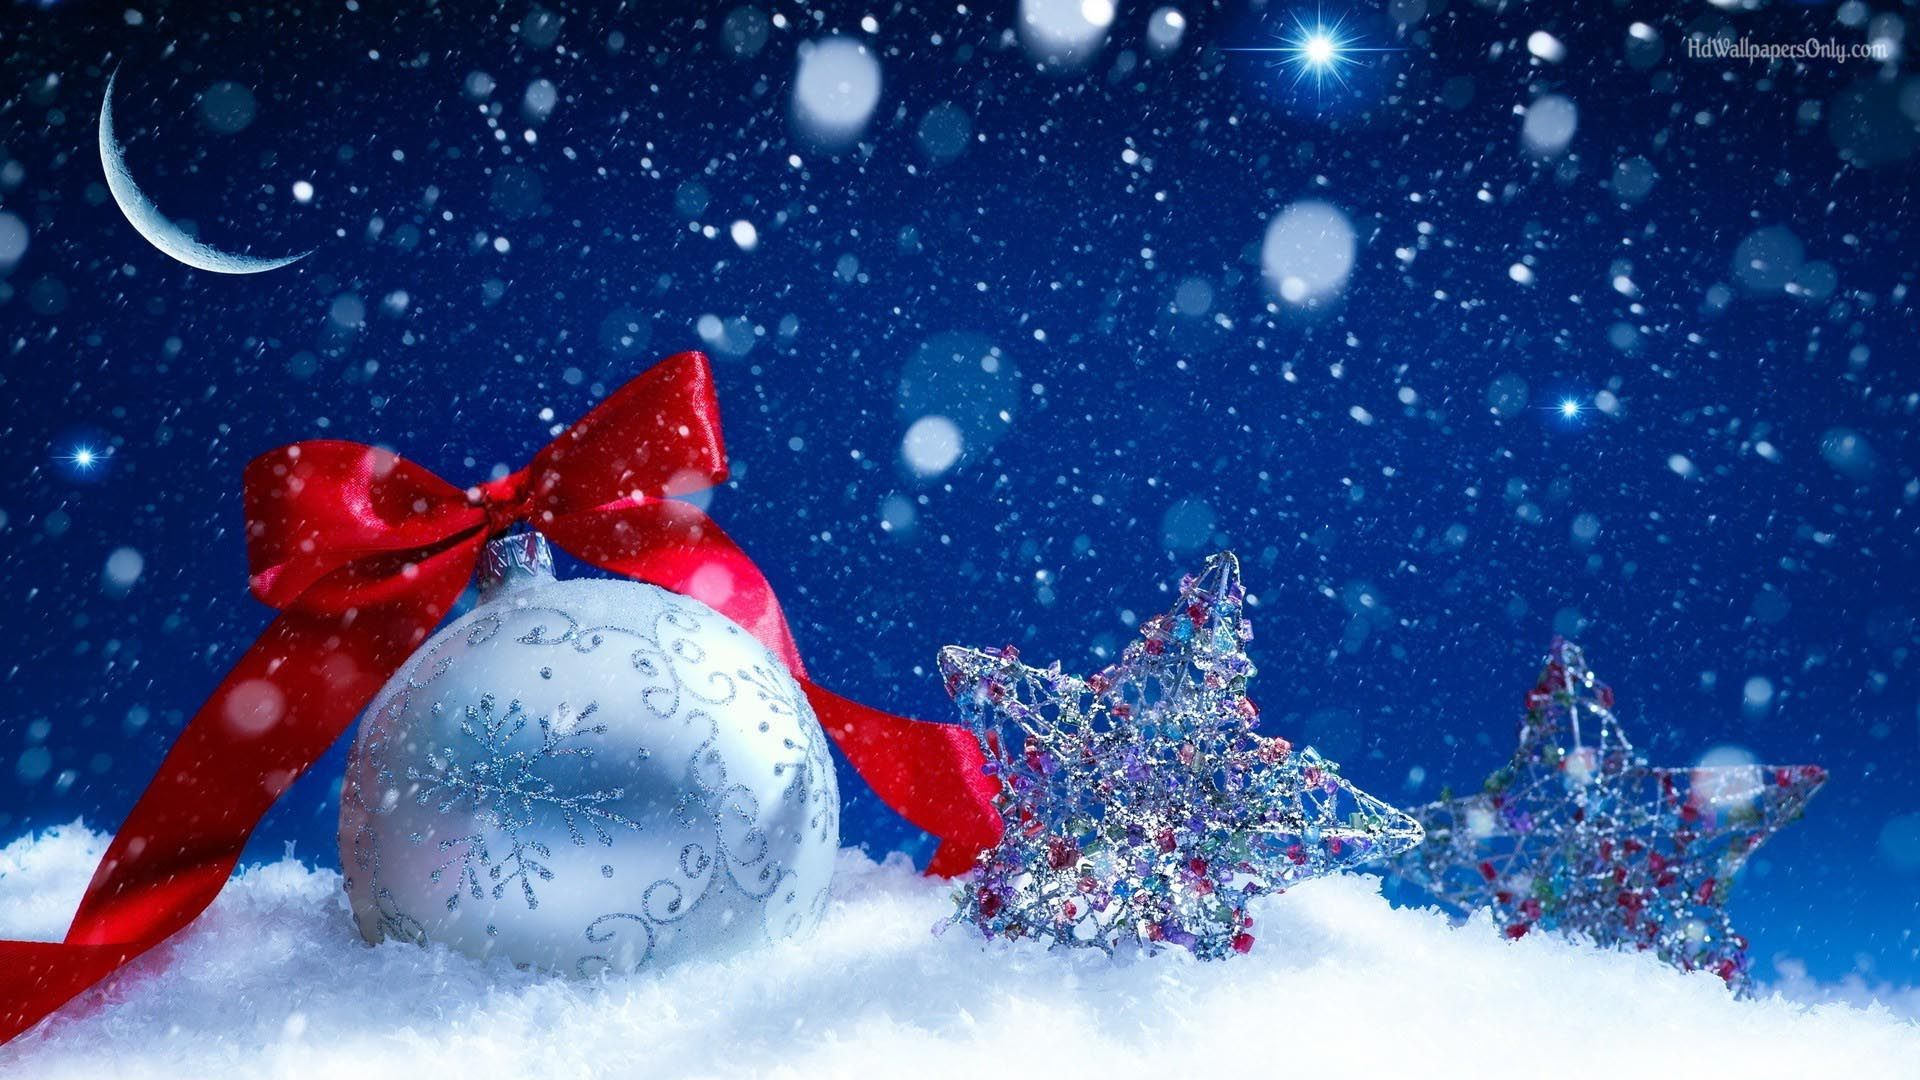 Animated Christmas Wallpaper 2 Cute Christmas Wallpaper Cute Christmas Backgrounds Christmas Desktop Wallpaper